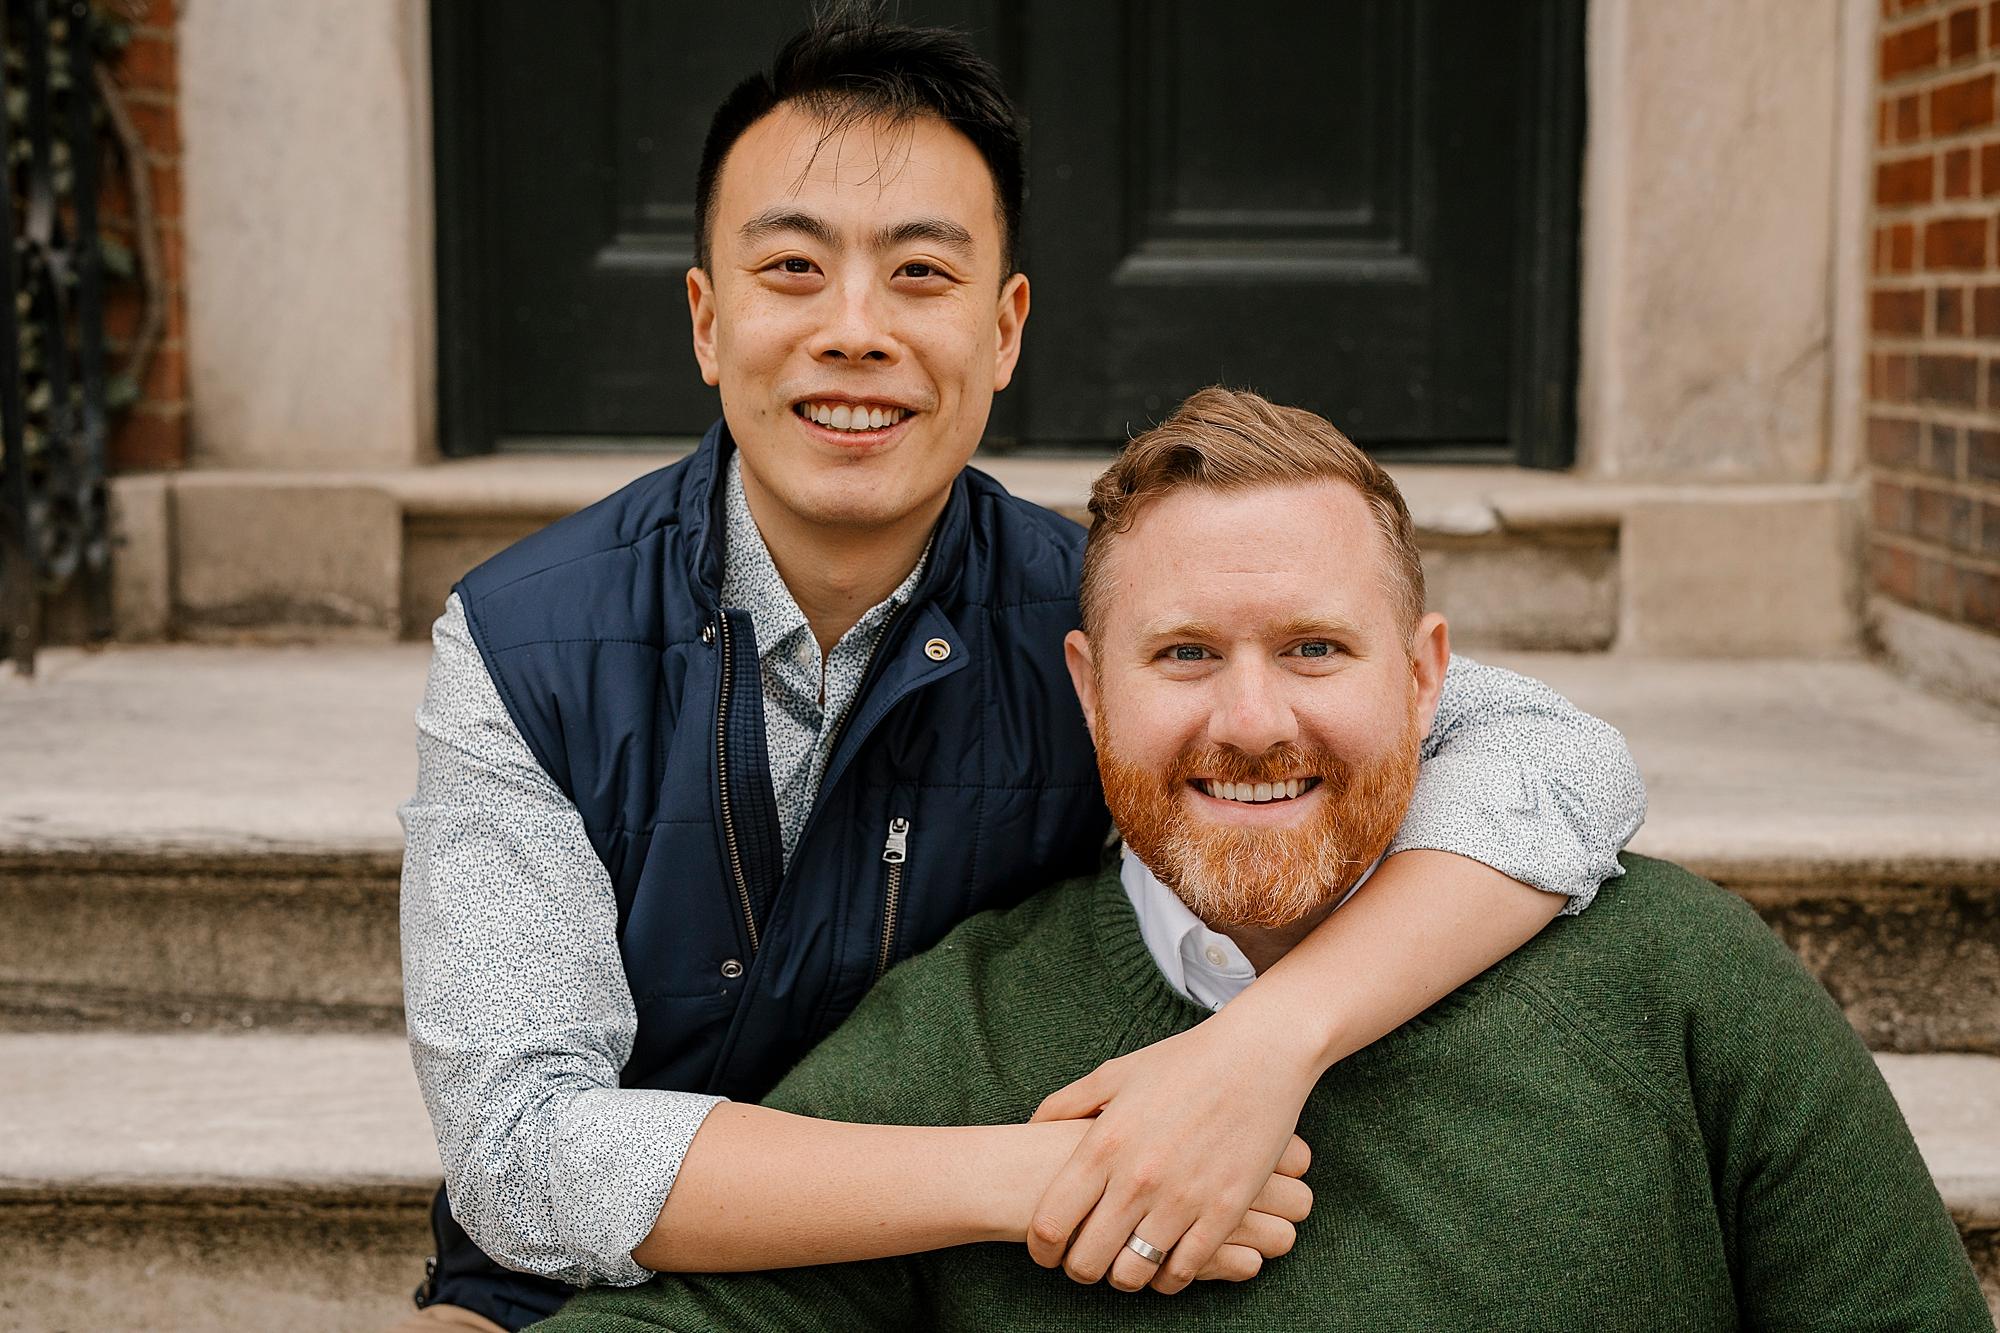 Love_BY_Joe_Mac_Creative_Philadelphia_Philly_Wedding_Photography_Gay_LGBT_Queer_Washington_Square_Park_Philadelphia__0018.jpg